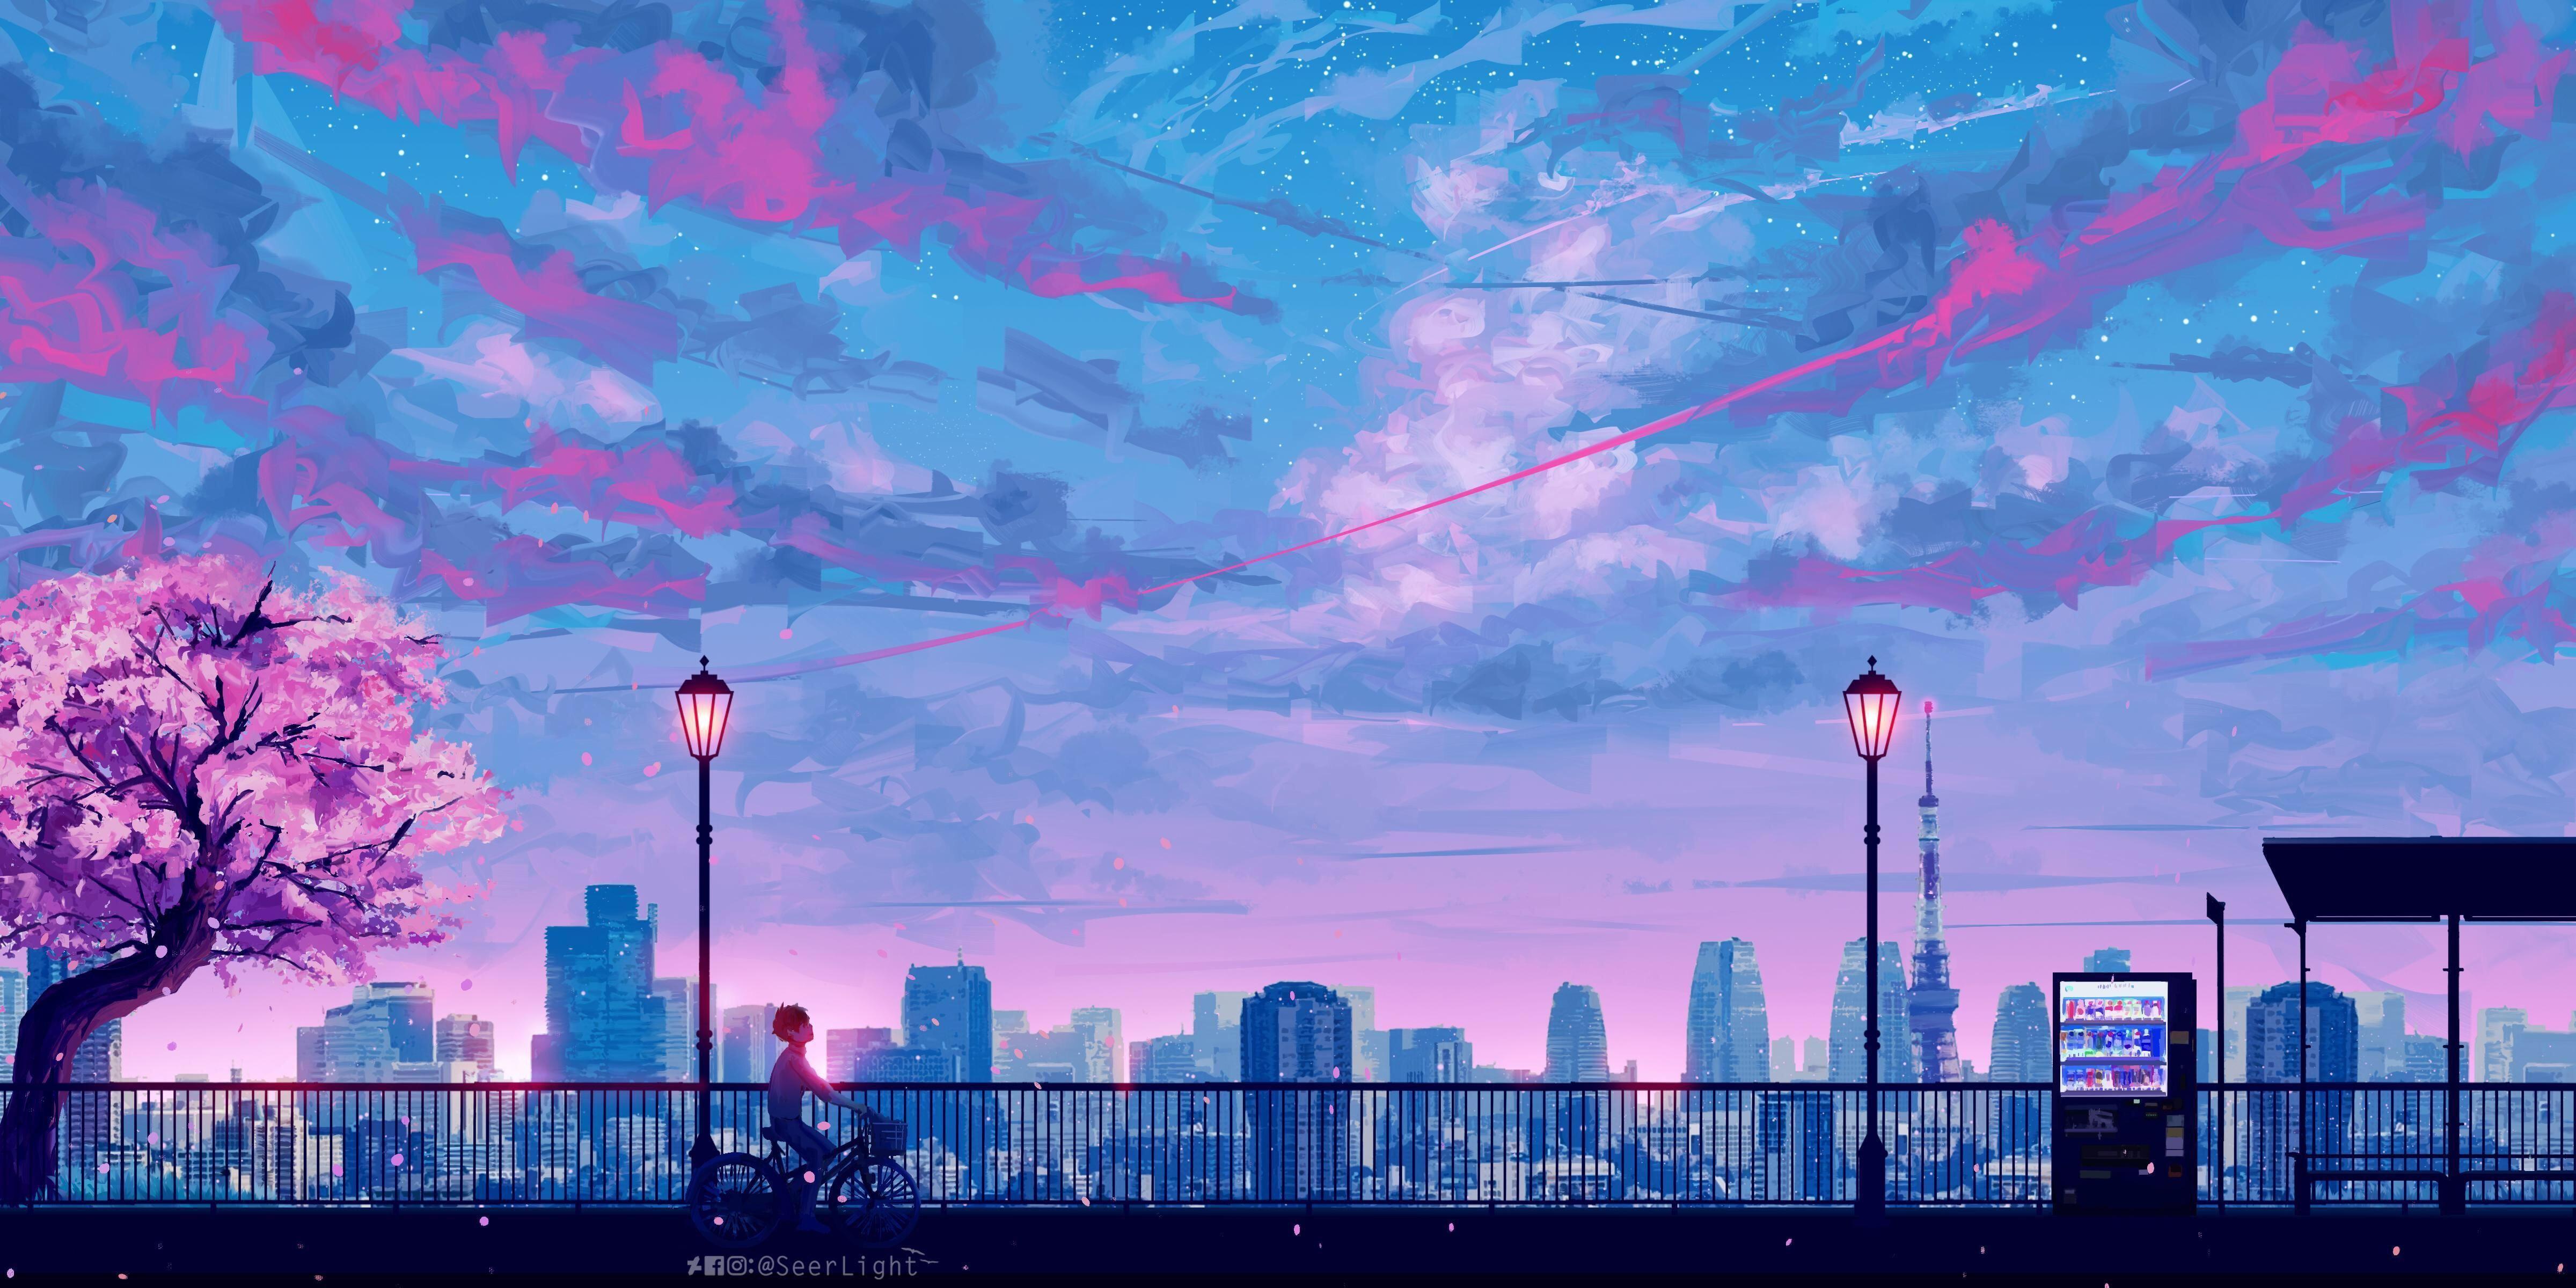 Anime 1920x1080 Hd Desktop Wallpapers Top Free Anime 1920x1080 Hd Desktop Backgrounds Wallp Anime Wallpaper 1920x1080 Anime Scenery Anime Scenery Wallpaper